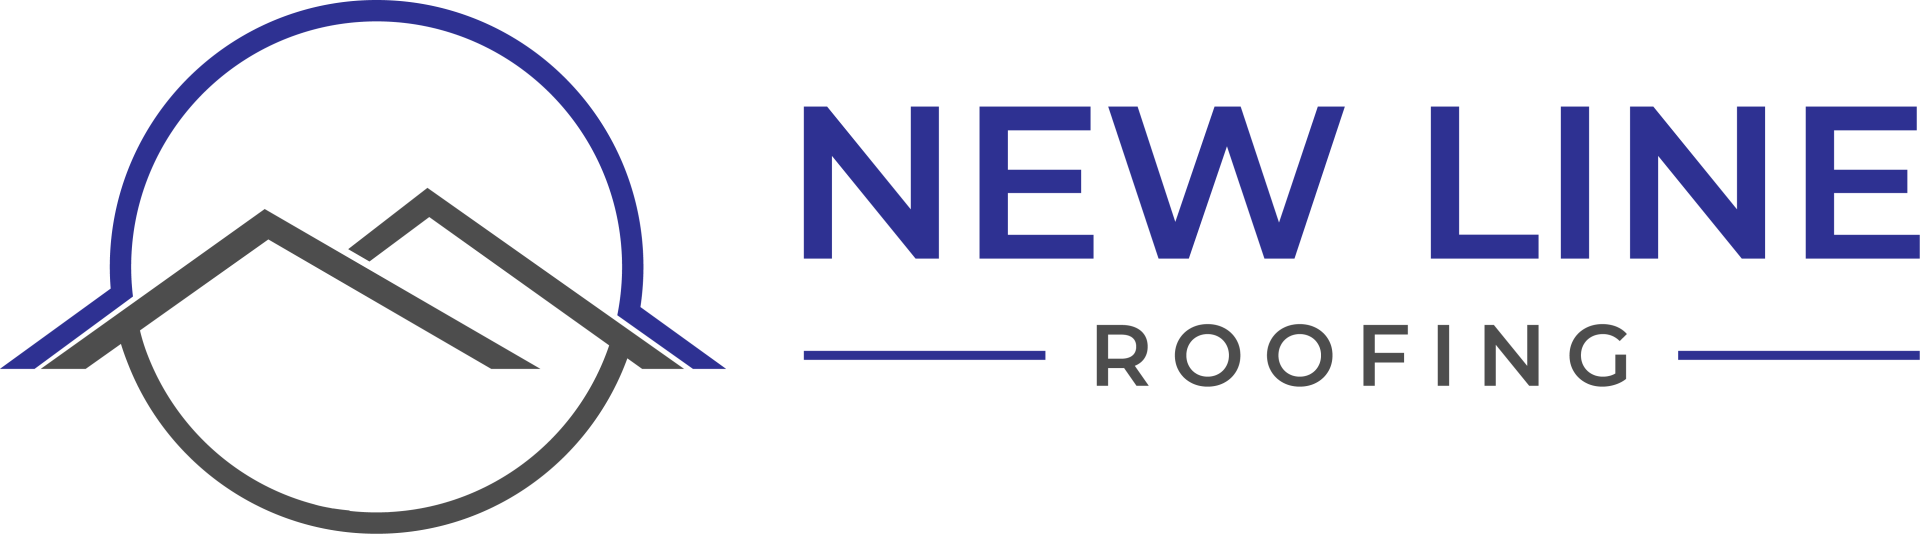 Denver S Premier Roofing Contractors New Line Roofing